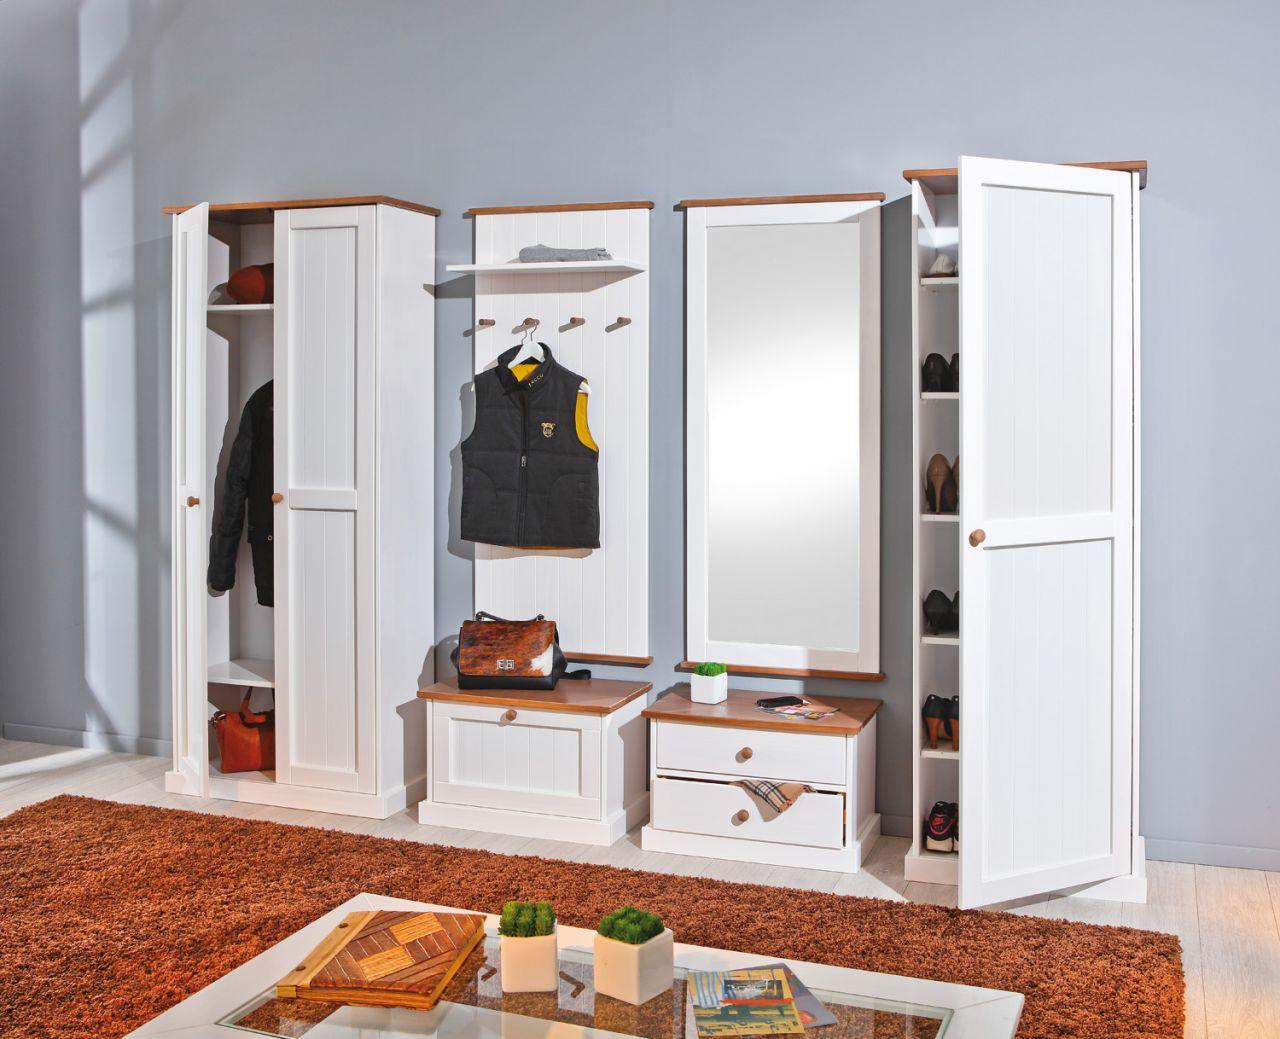 6 tlg. garderobe garderobenset landhausstil massivholz 2-farbig